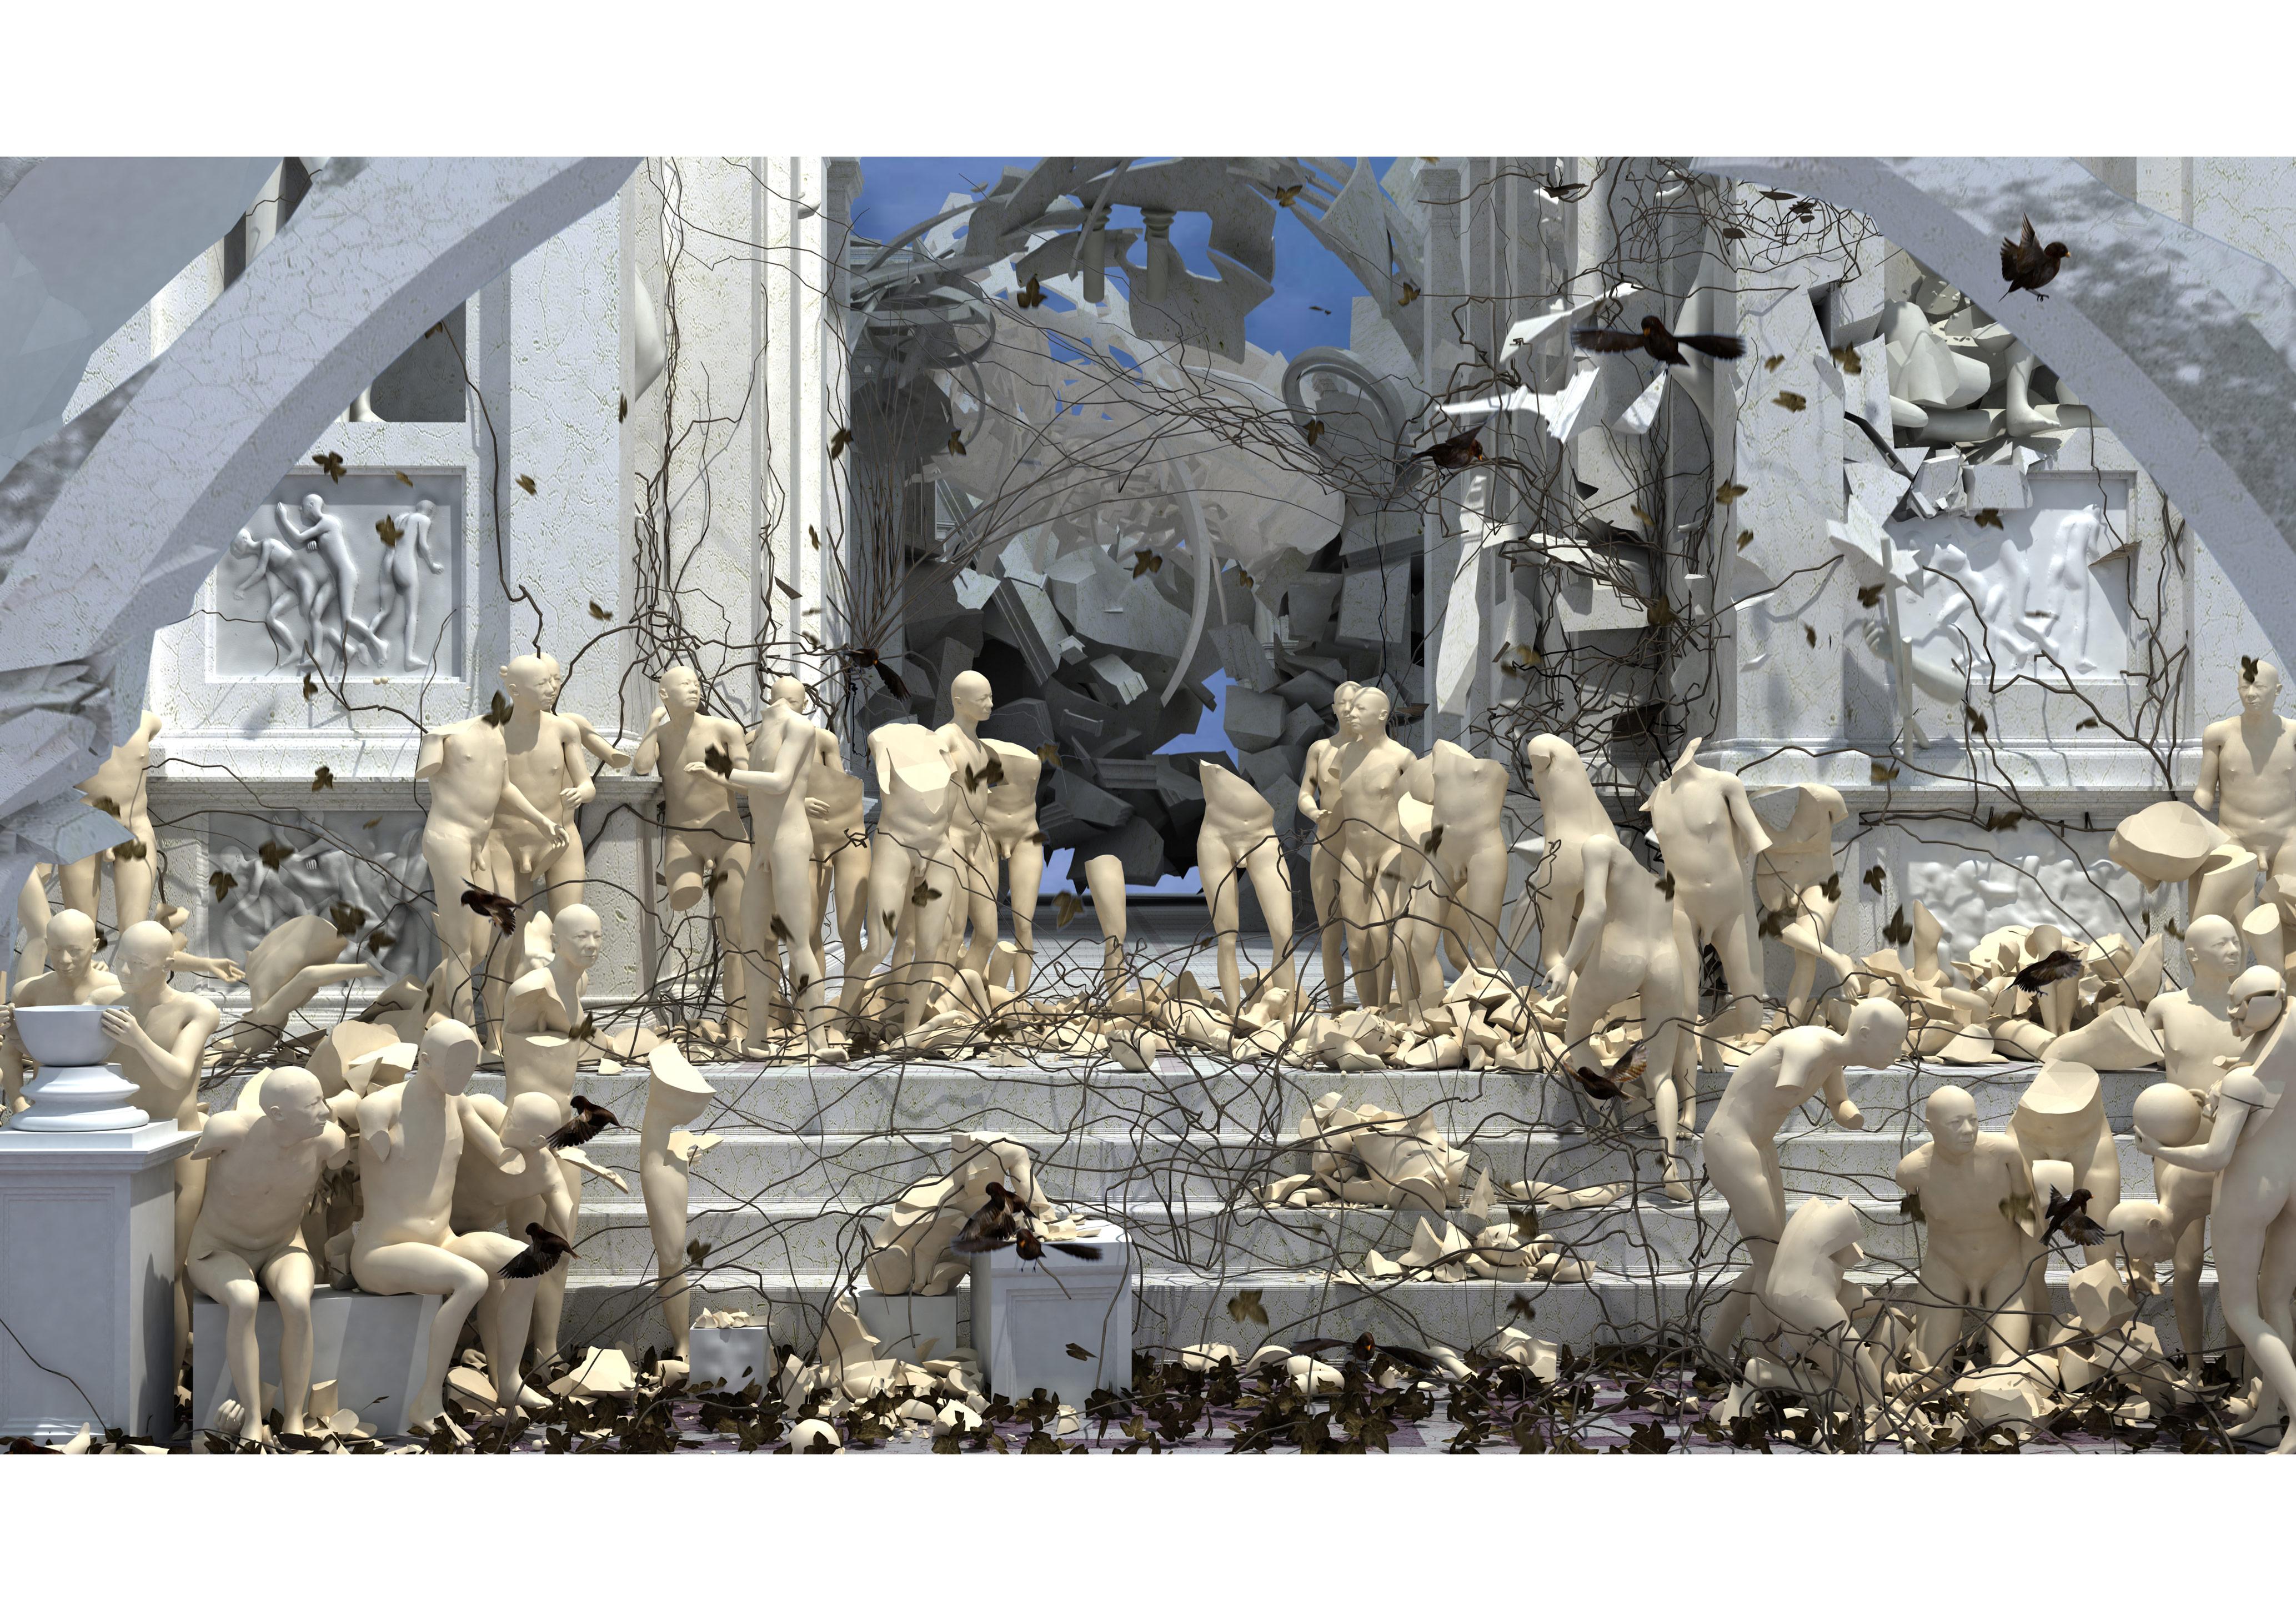 "Miao Xiaochun,Restart 2008-20103D computer animation 14'22"", Edition 7"